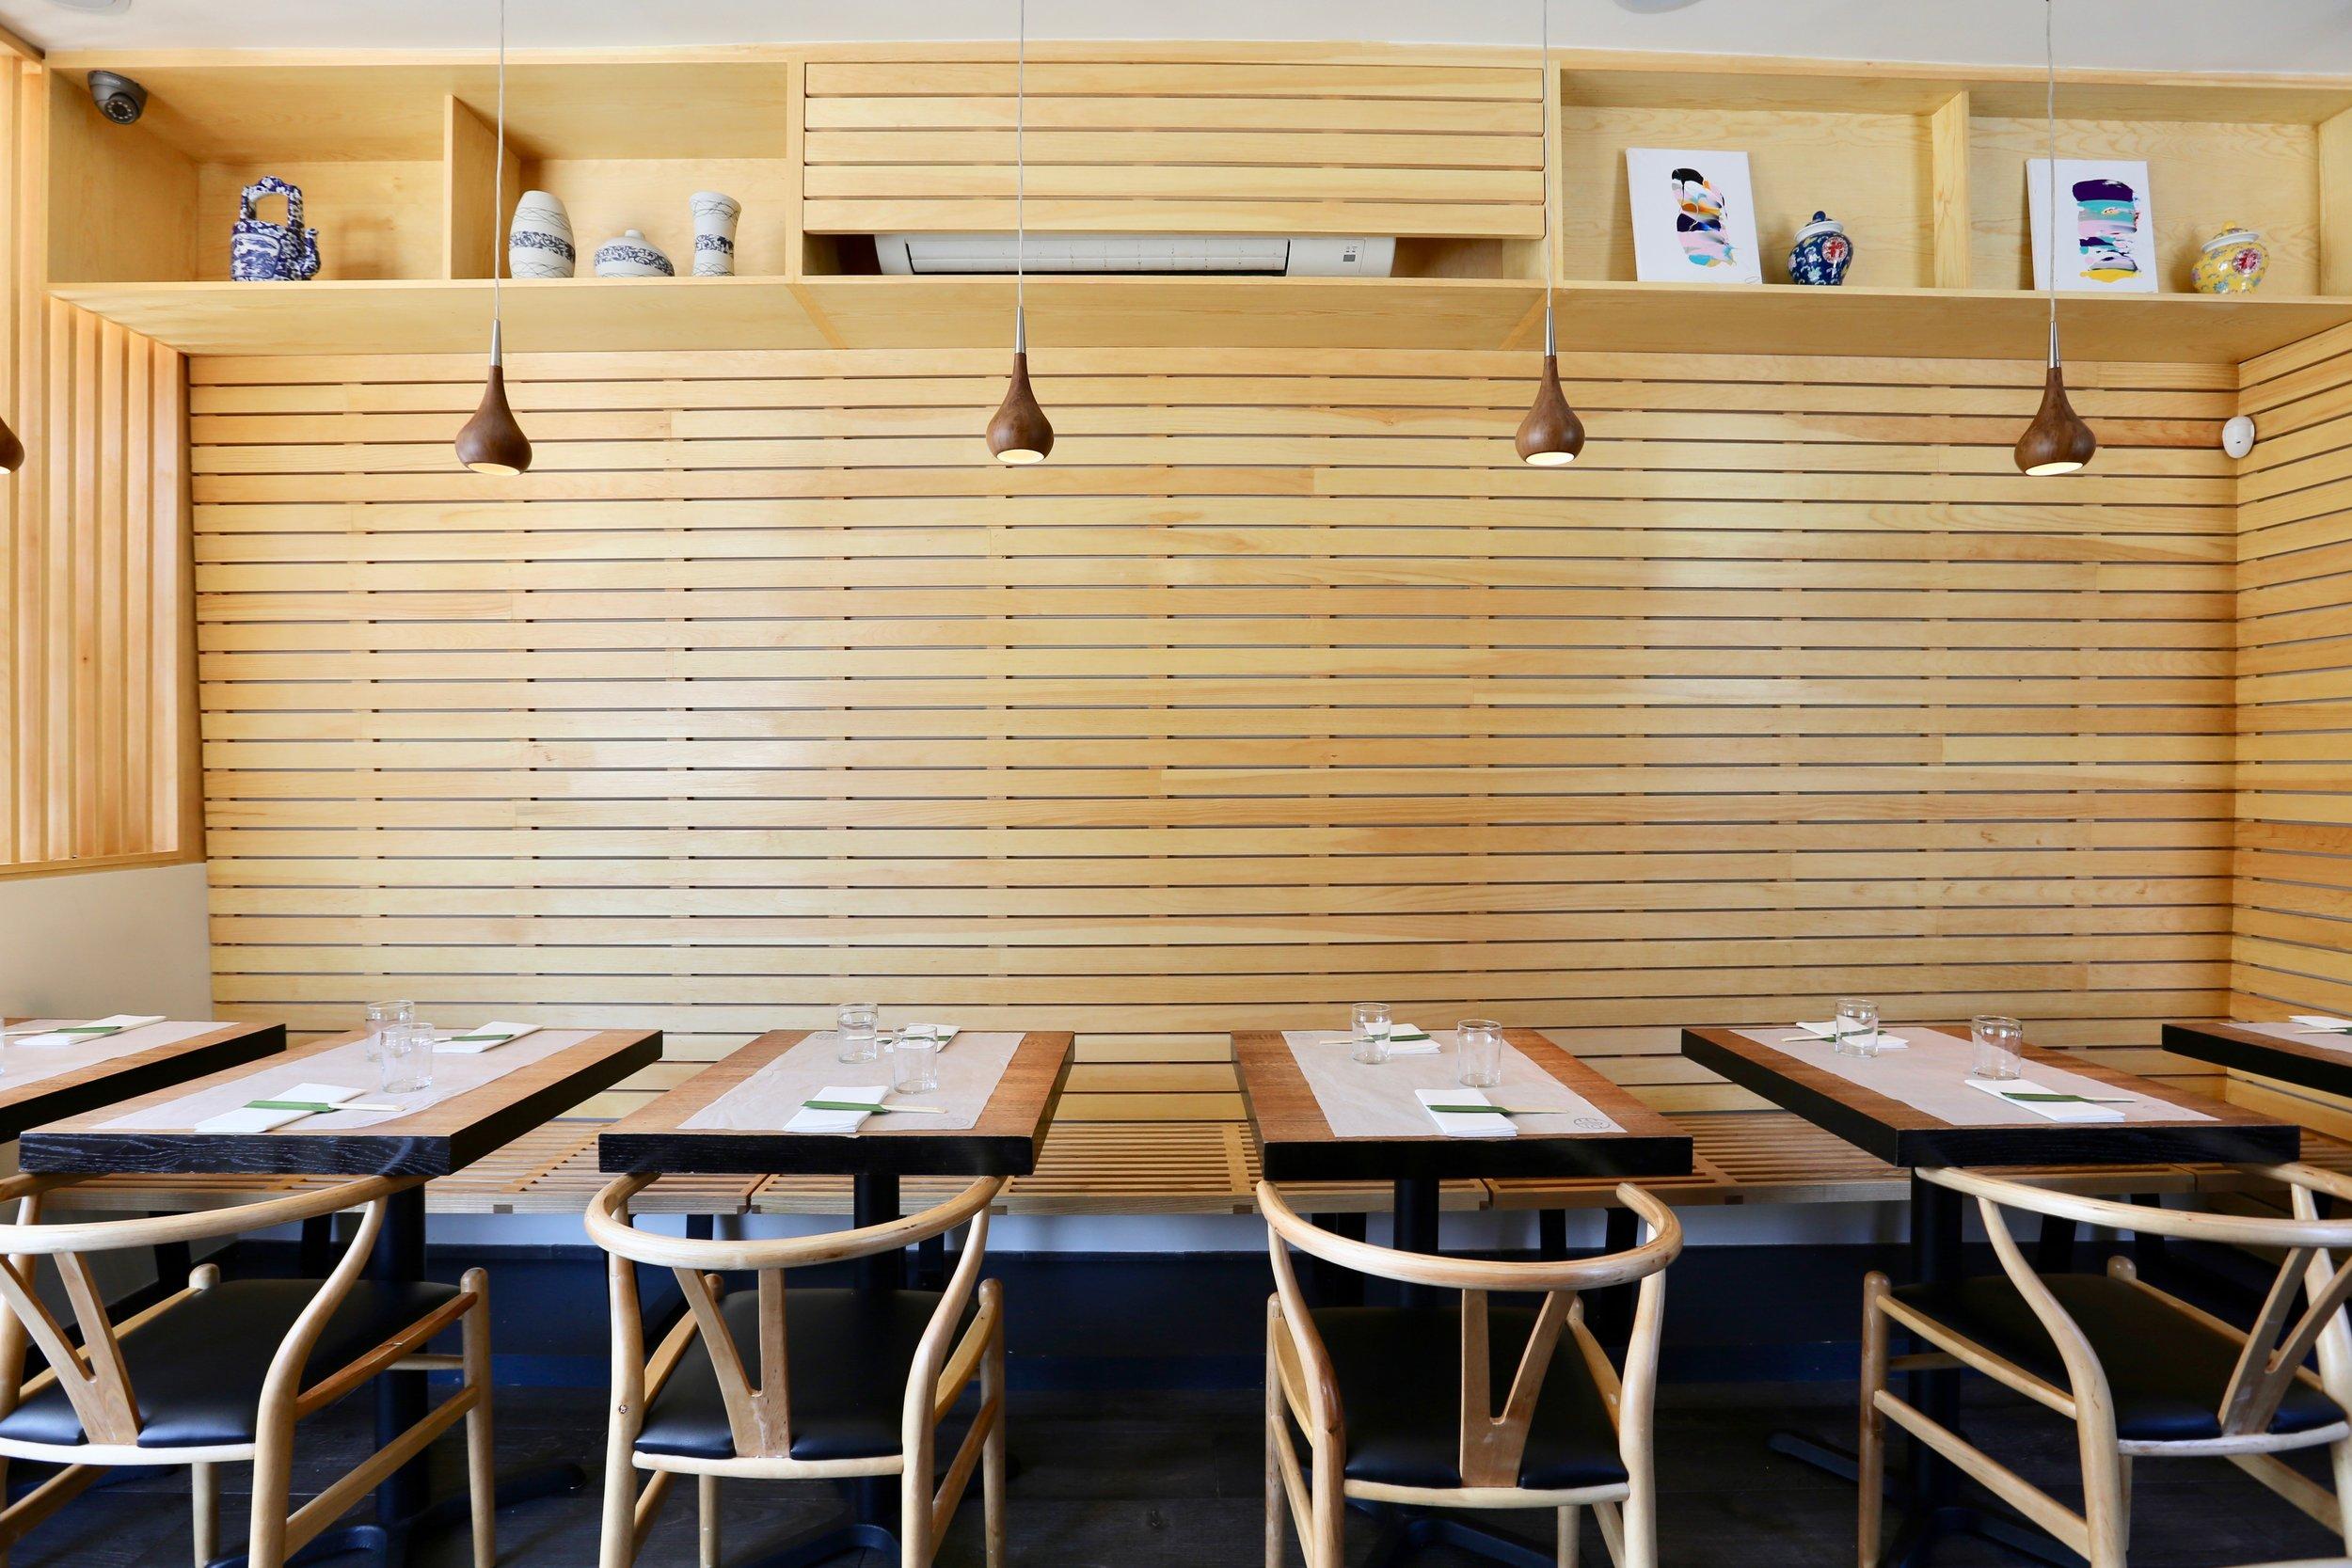 Little tong noodle shop interior.jpg